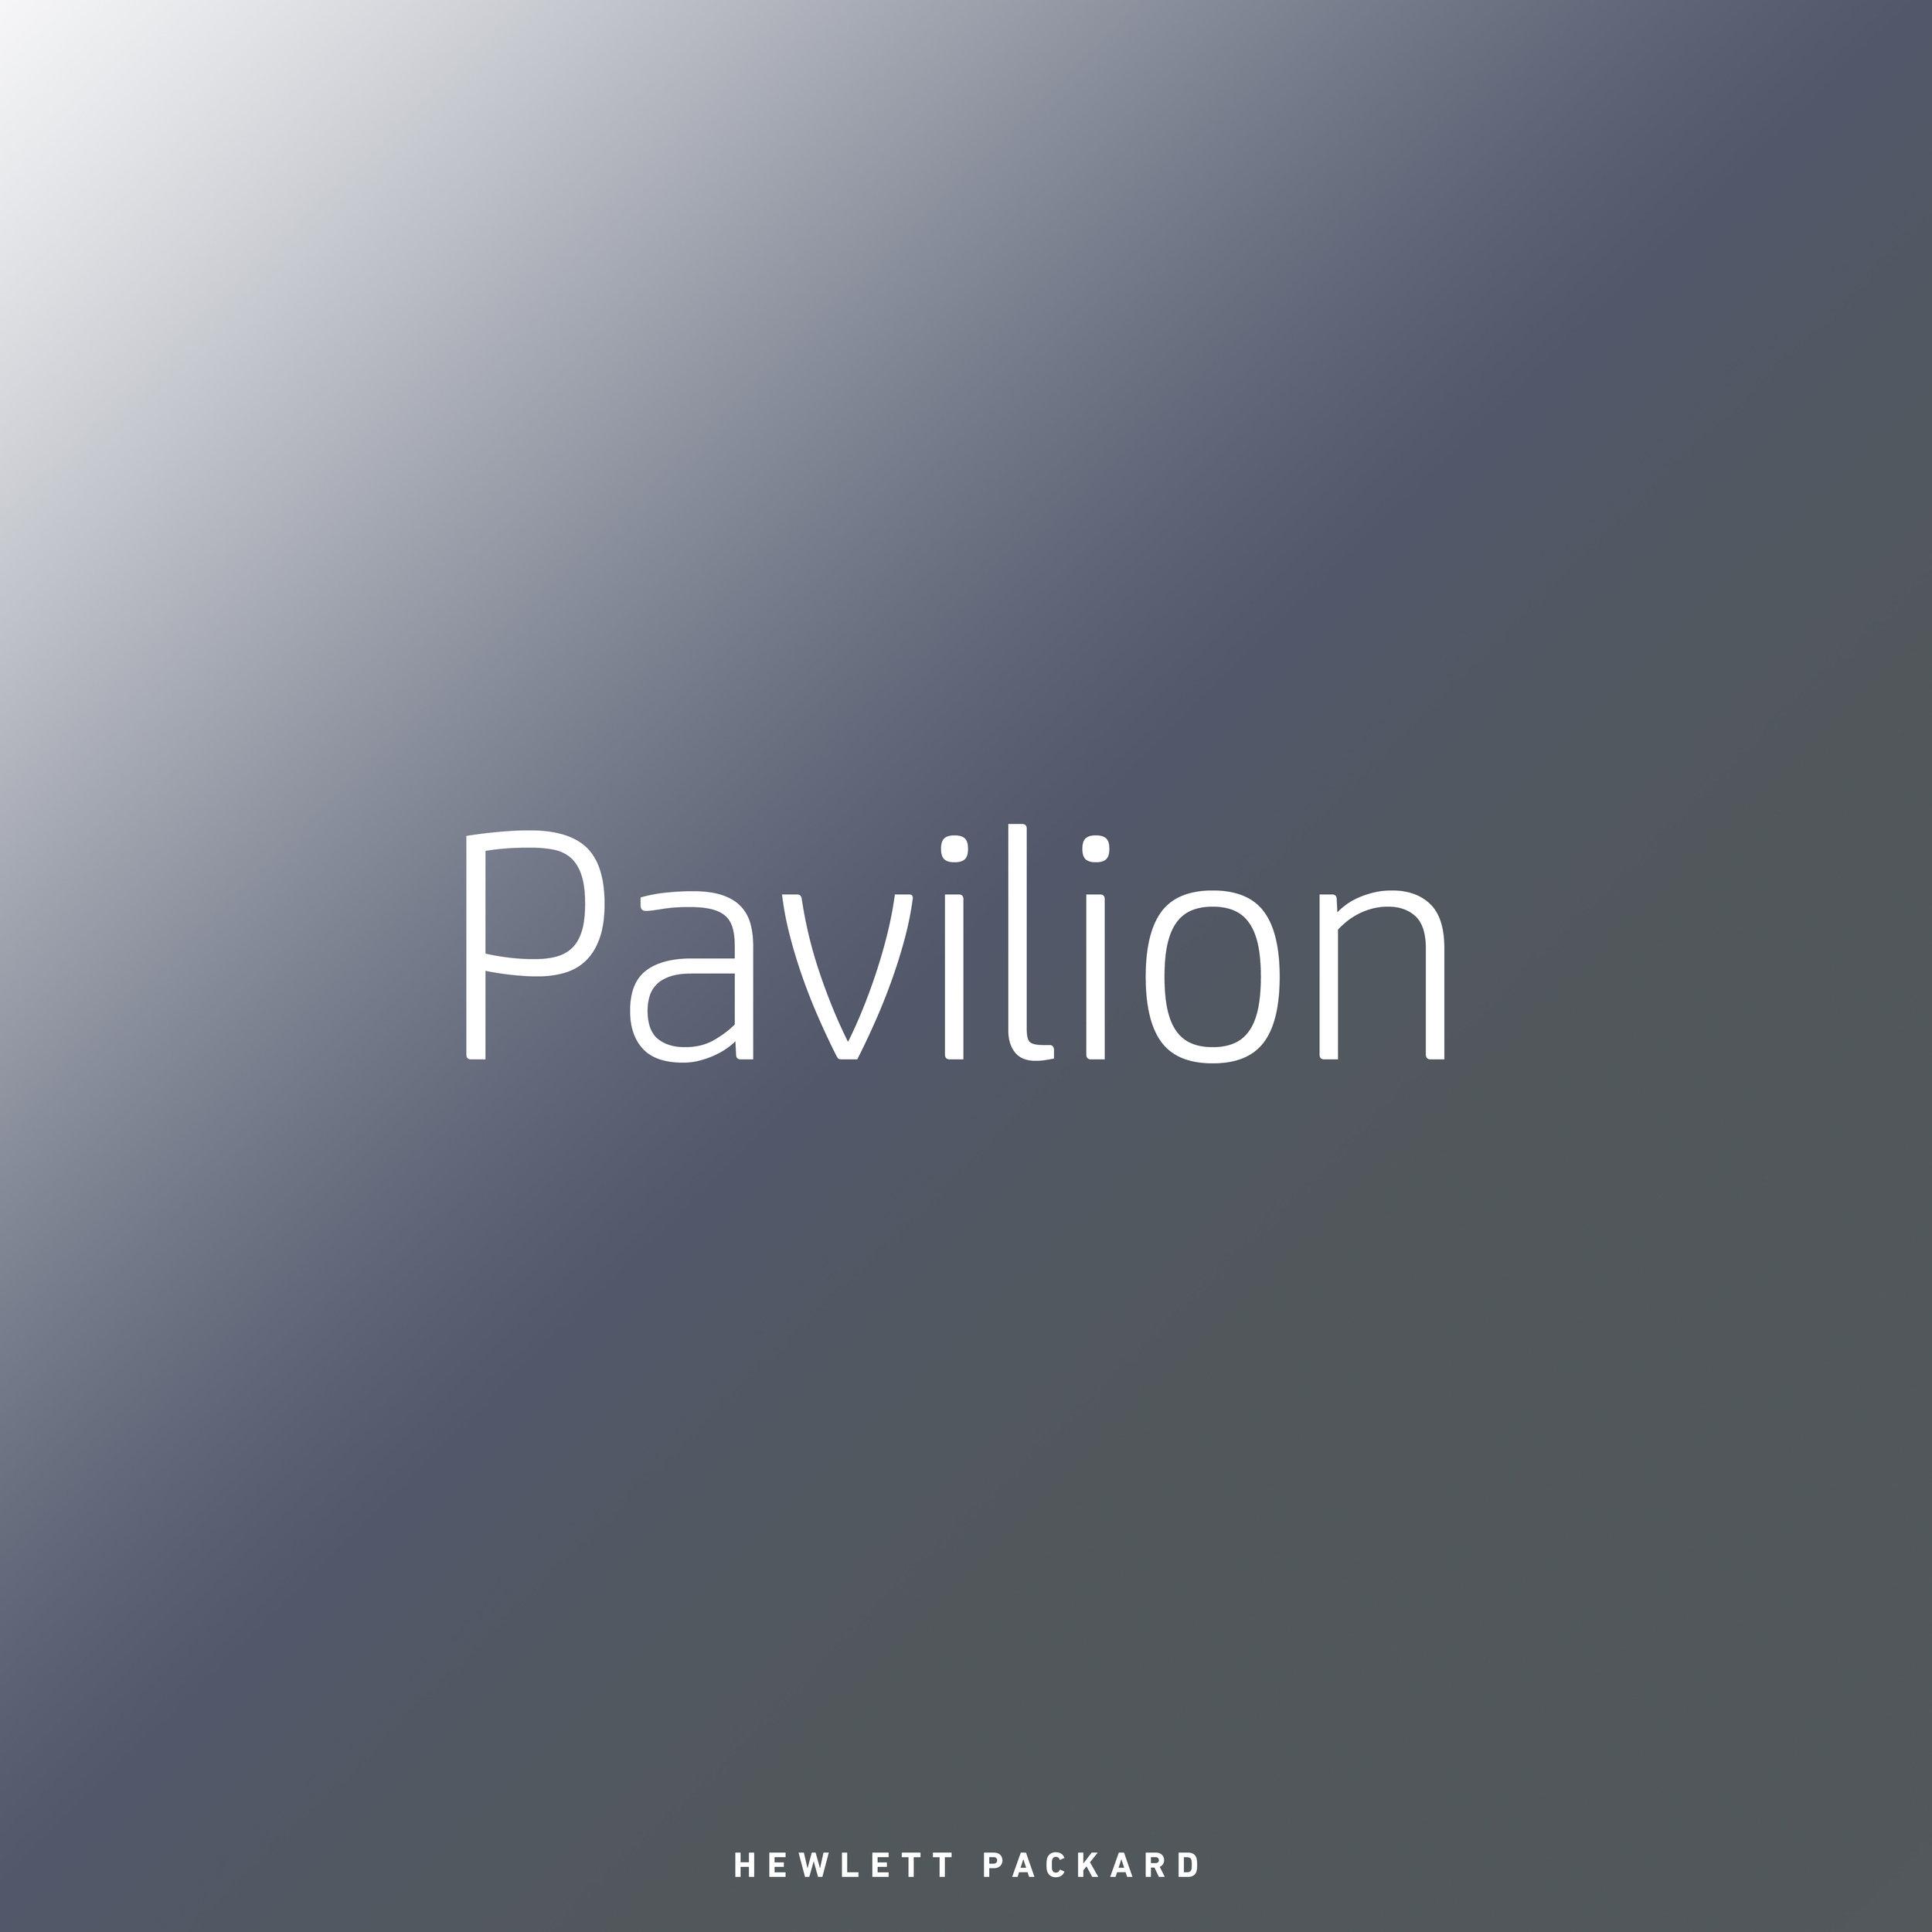 Pavilion (HP)